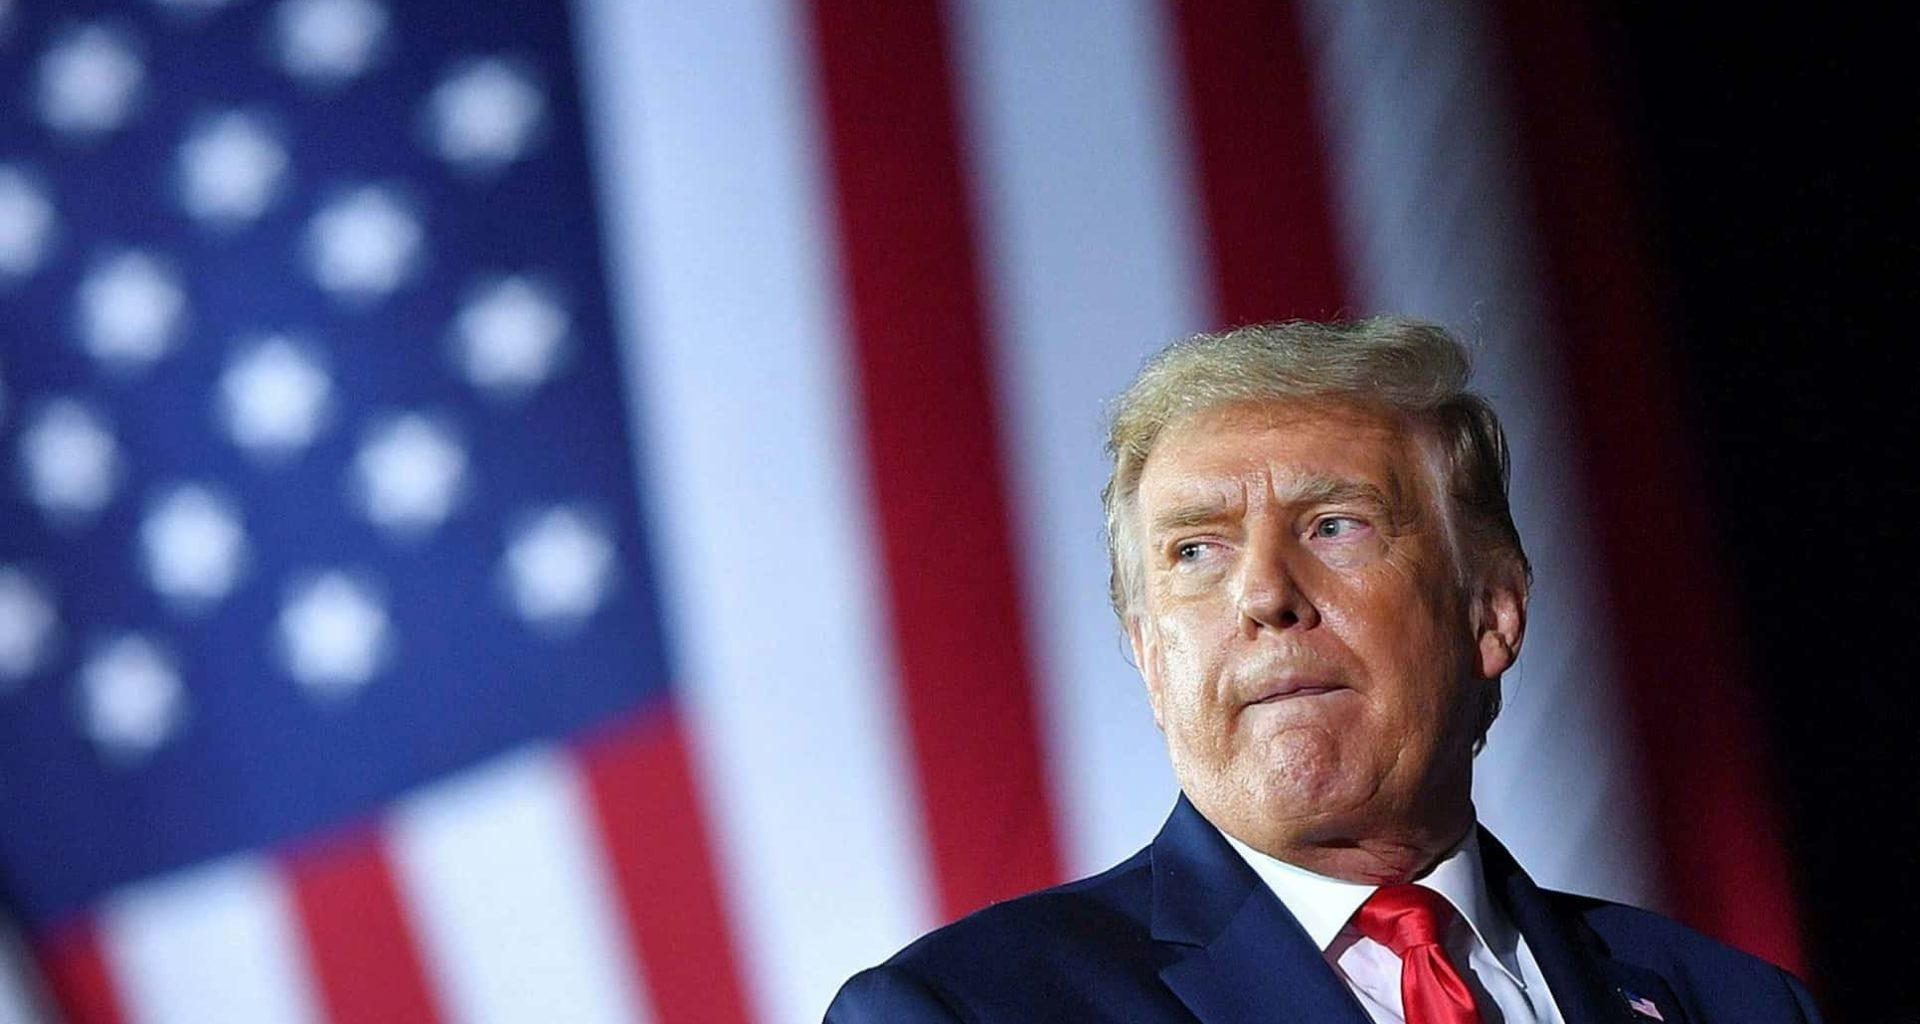 Newt Gingrich: Trump Should 'Close Down' The Legitimate Press